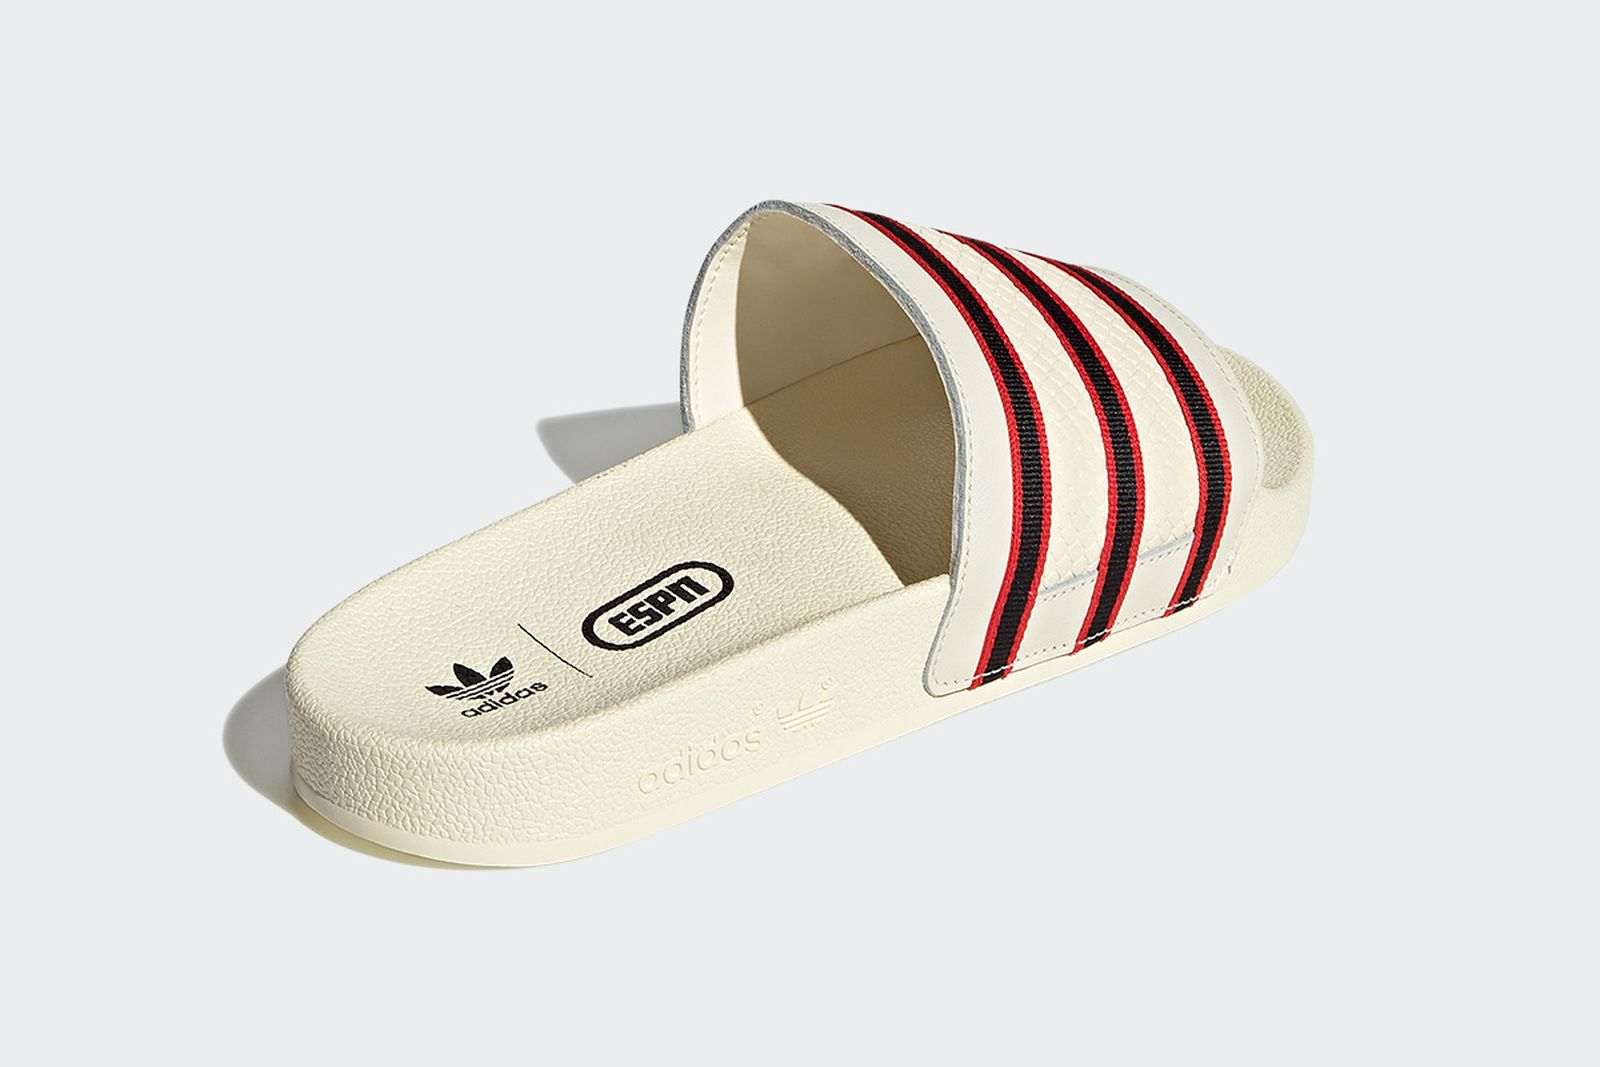 epsn-adidas-top-ten-hi-release-info-05